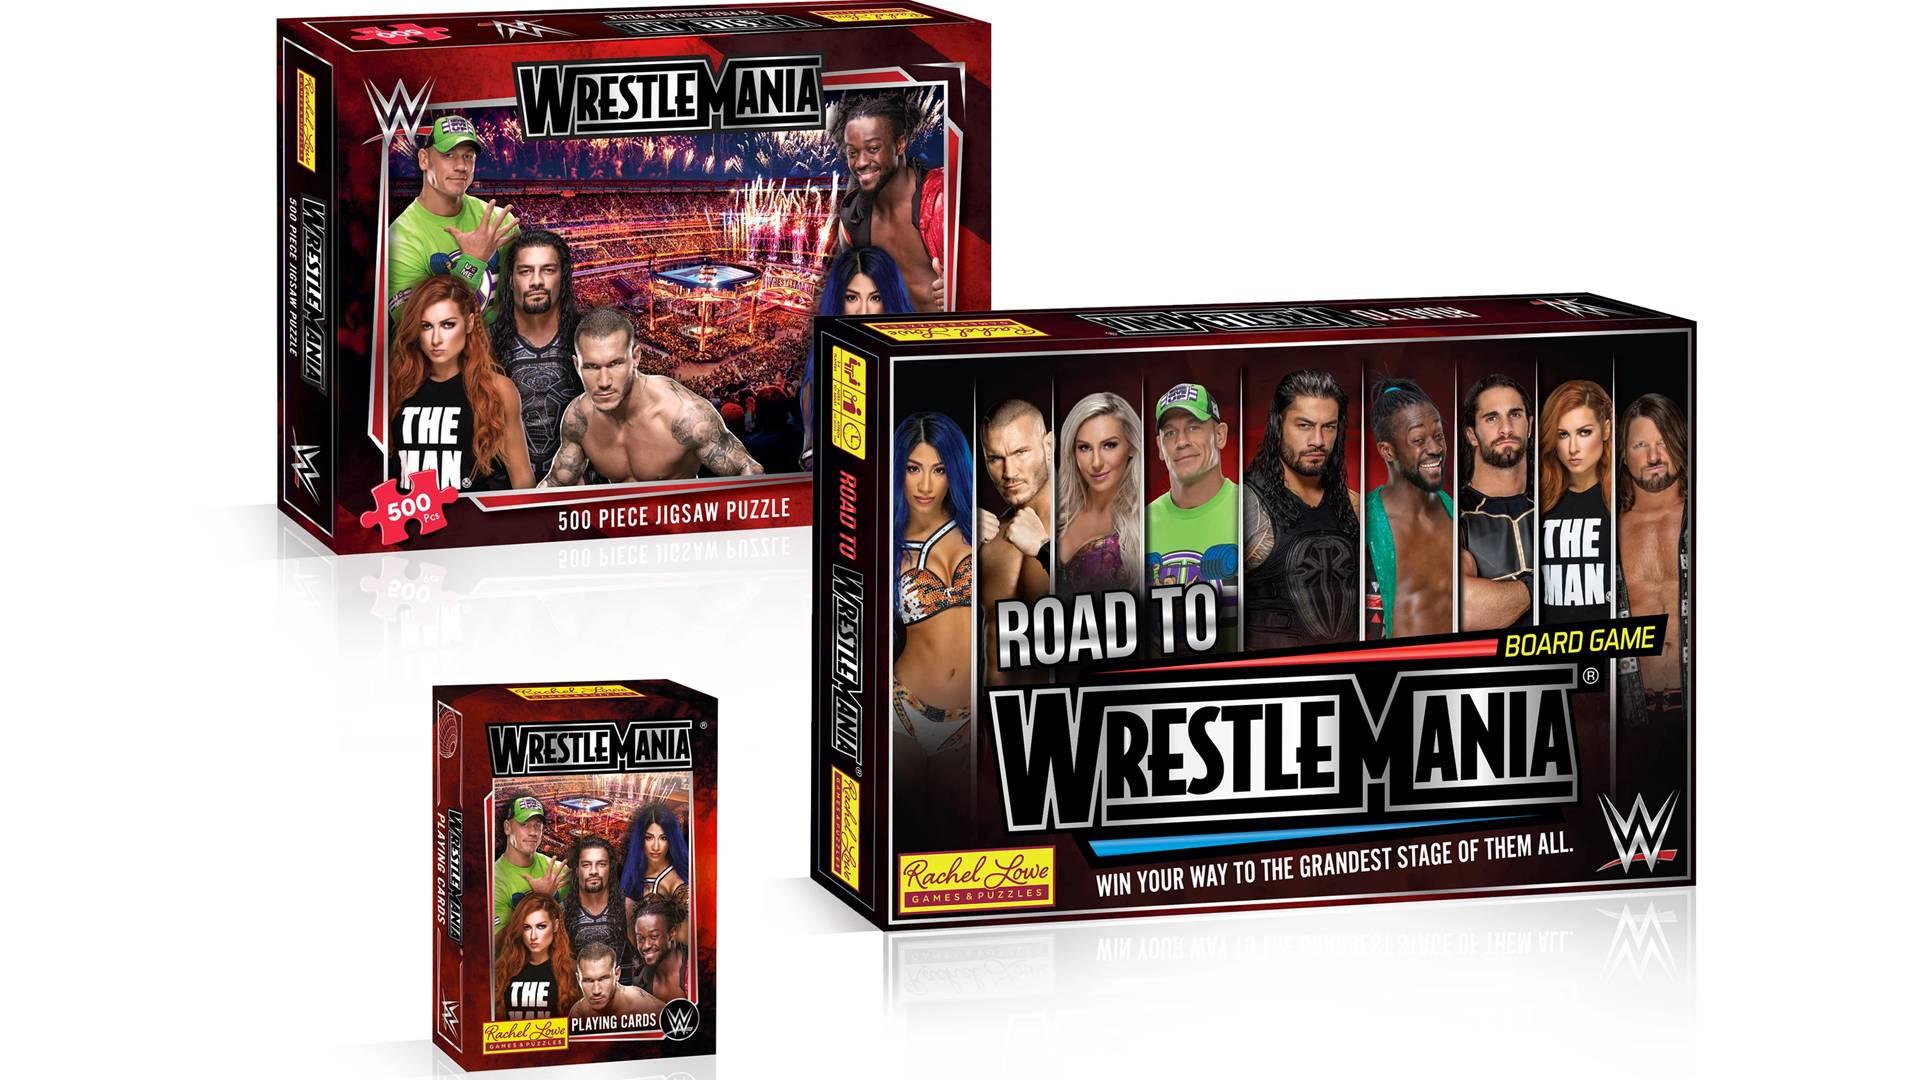 WWE: Road to WrestleMania